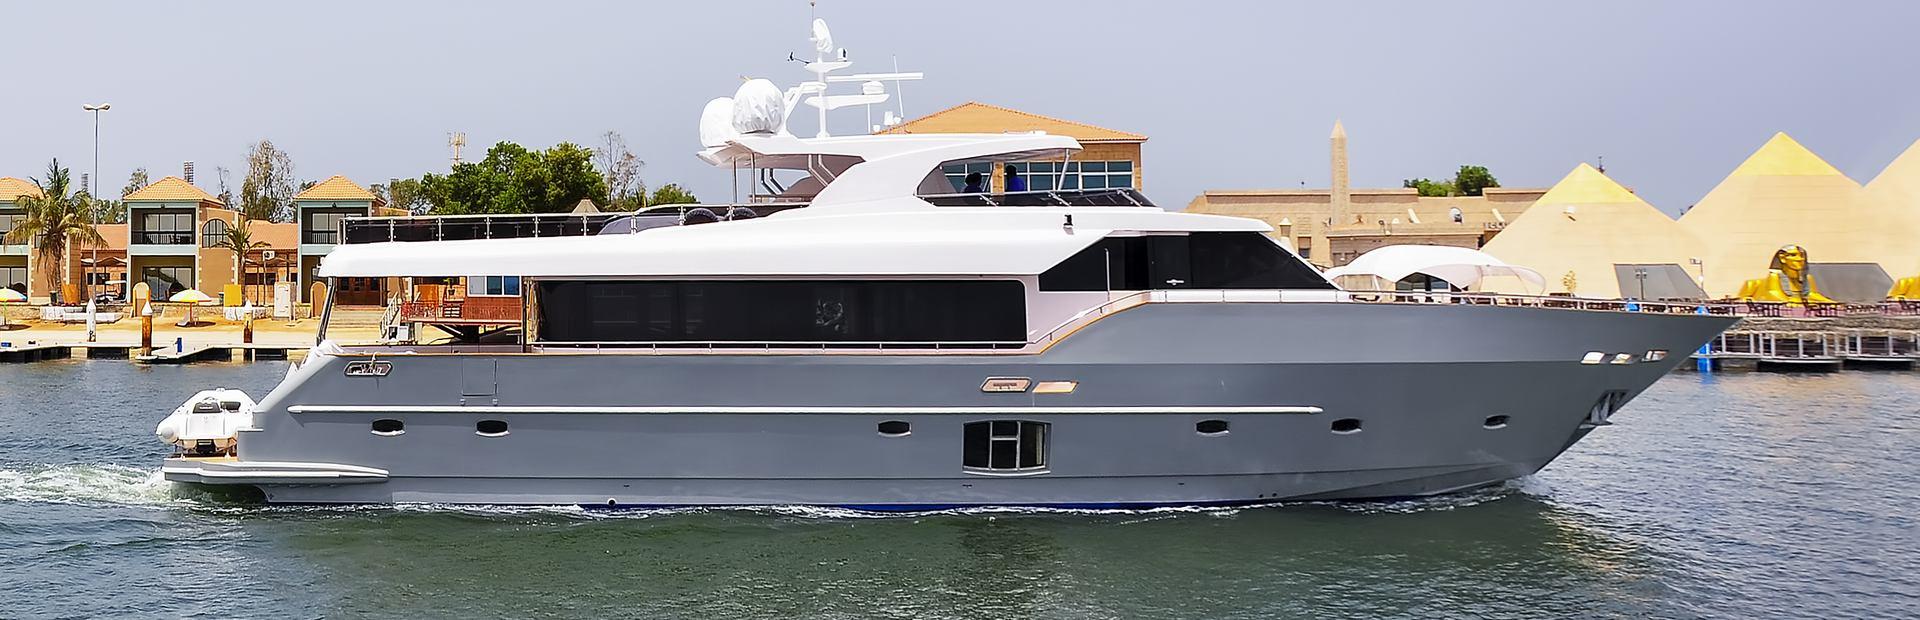 Gulf 95 Exp Yacht Charter